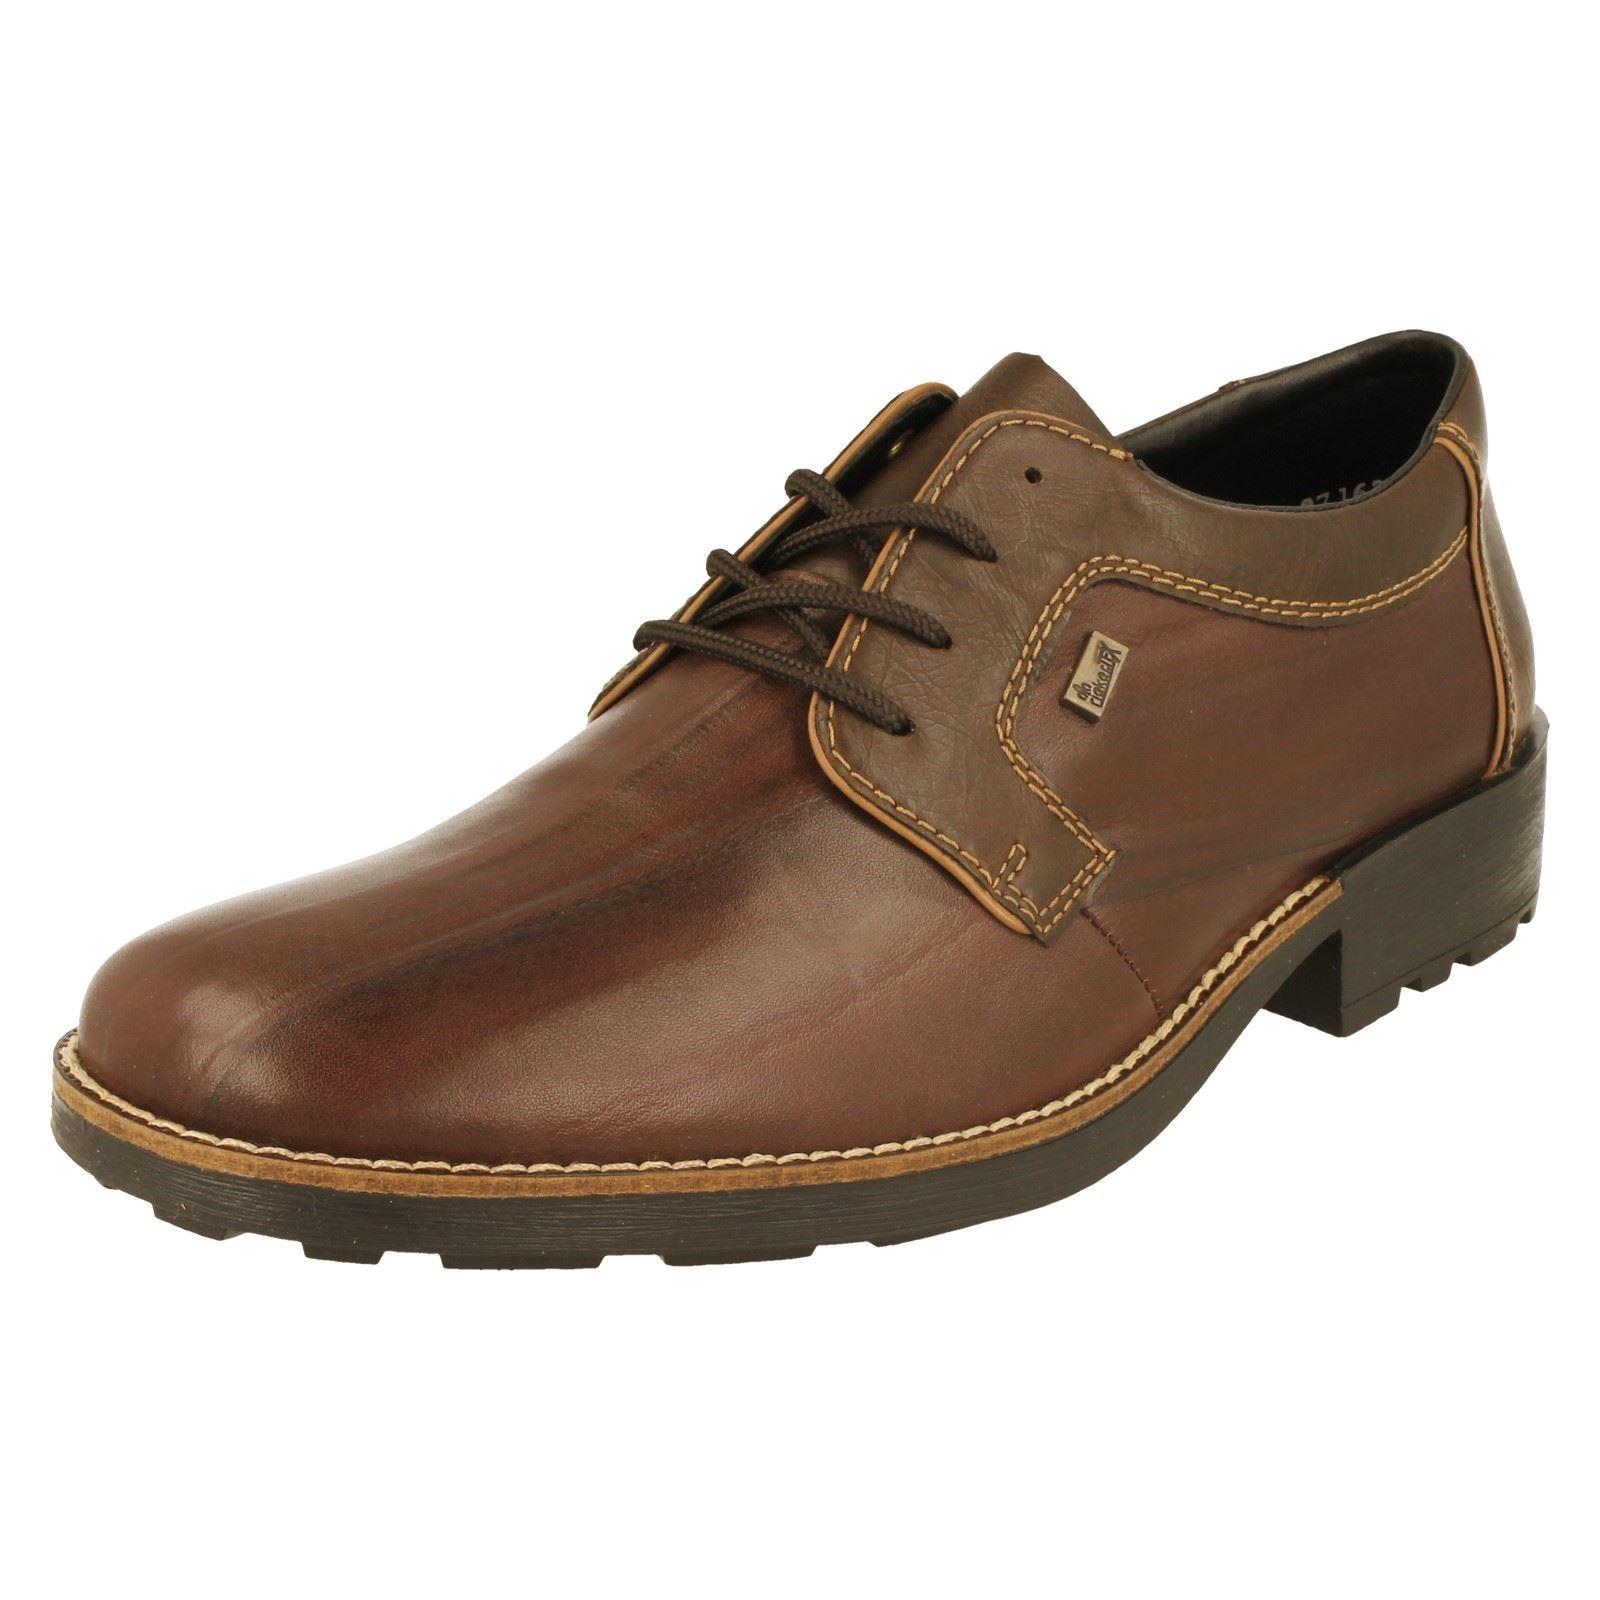 best sneakers 1a549 14587 Dettagli su Uomo Rieker Scarpe Eleganti '16024